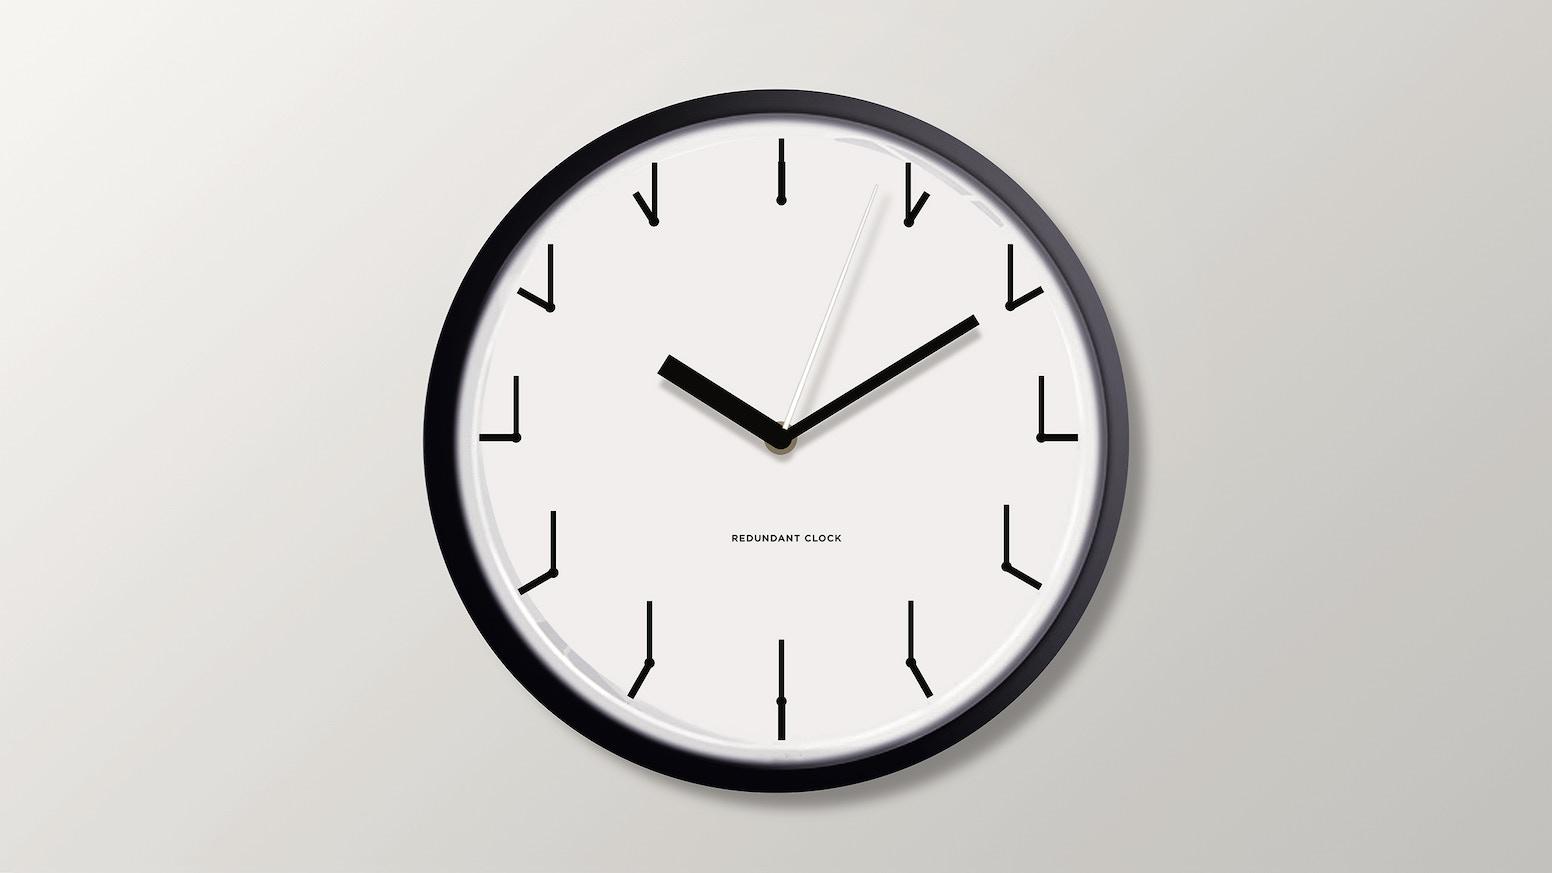 Image result for redundant-clock 2